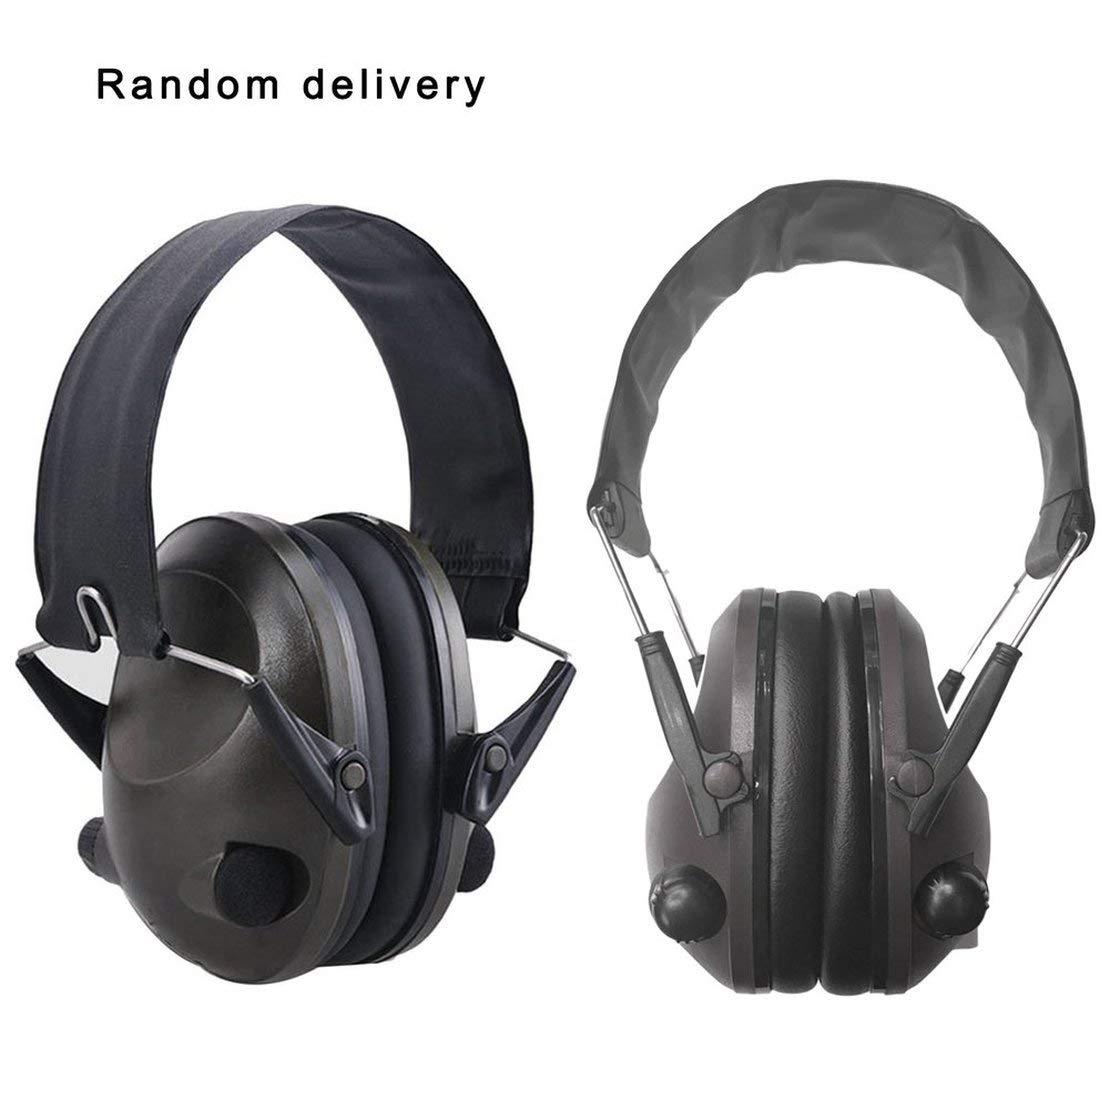 TAC 6S faltbar Design Anti-Verlust, Noise Cancelling Tactical Shooting Headset Soft Padded Electronic Earmuff fü r die sportliche Jagd, schwarz, 1 Hermosairis